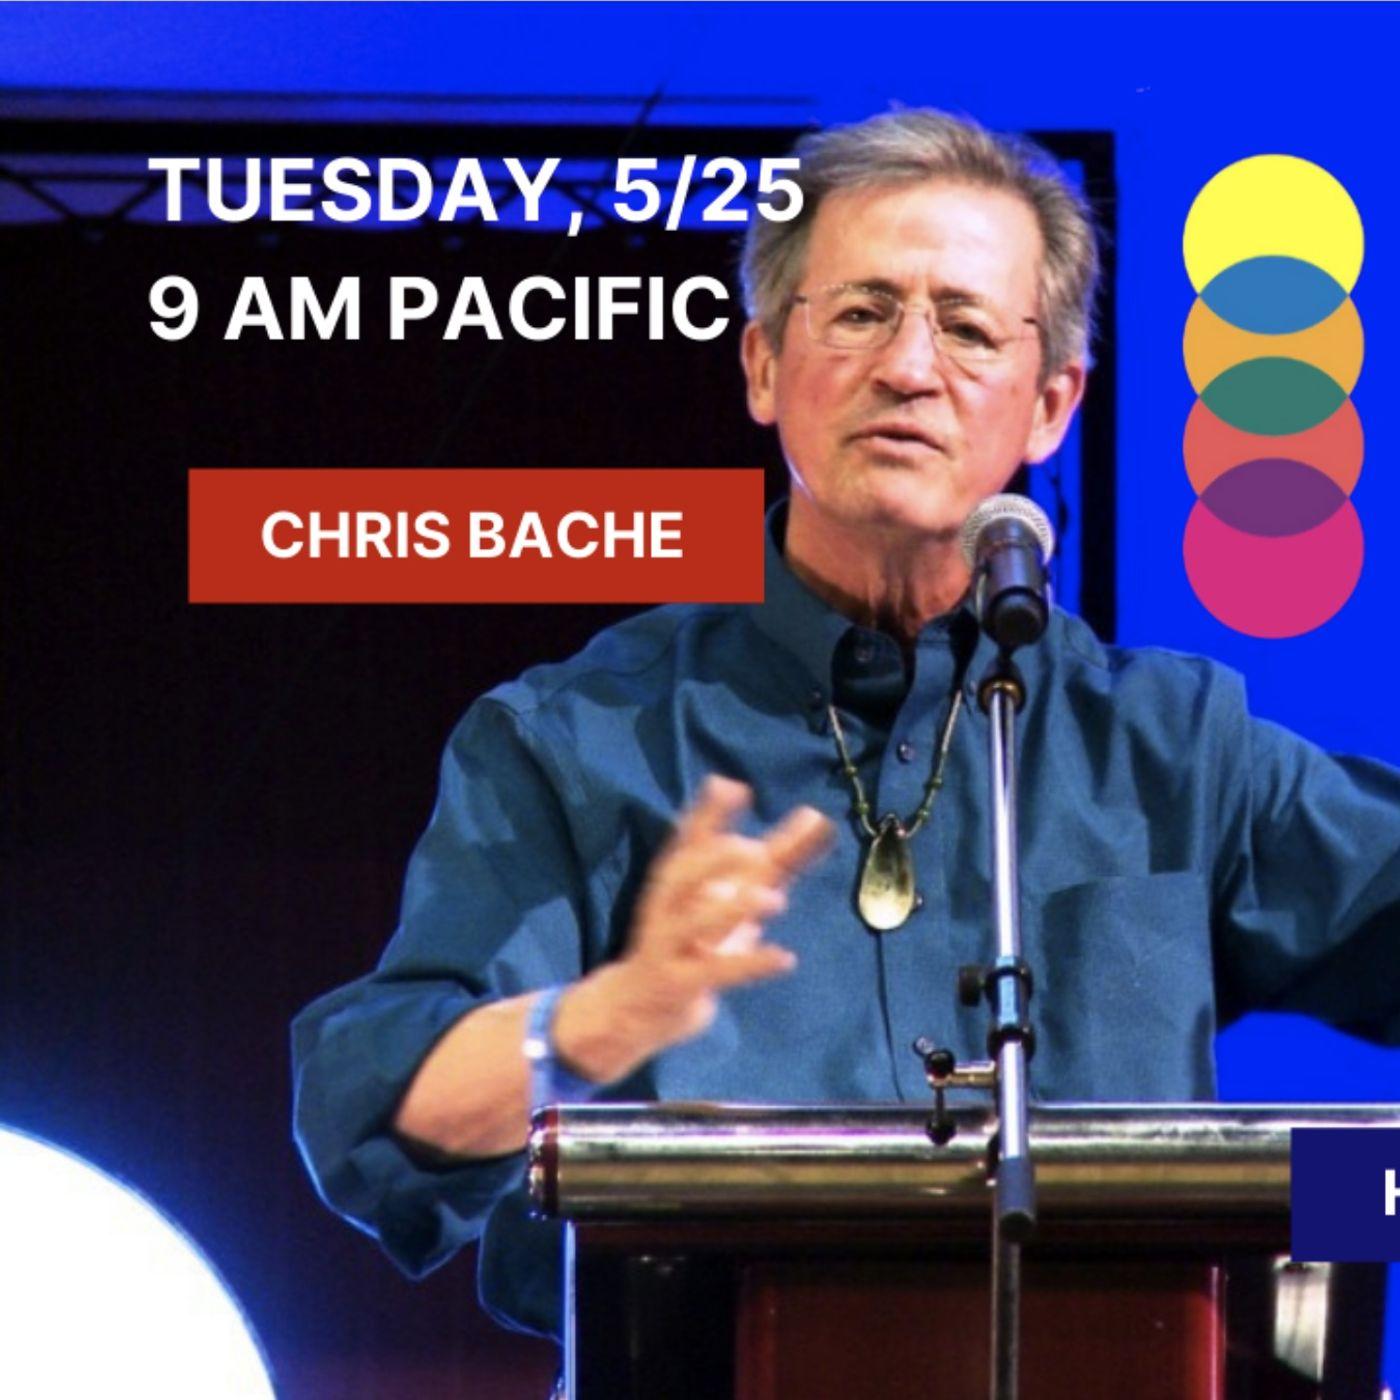 Chris Bache - Mind, Body, Health, and Politics